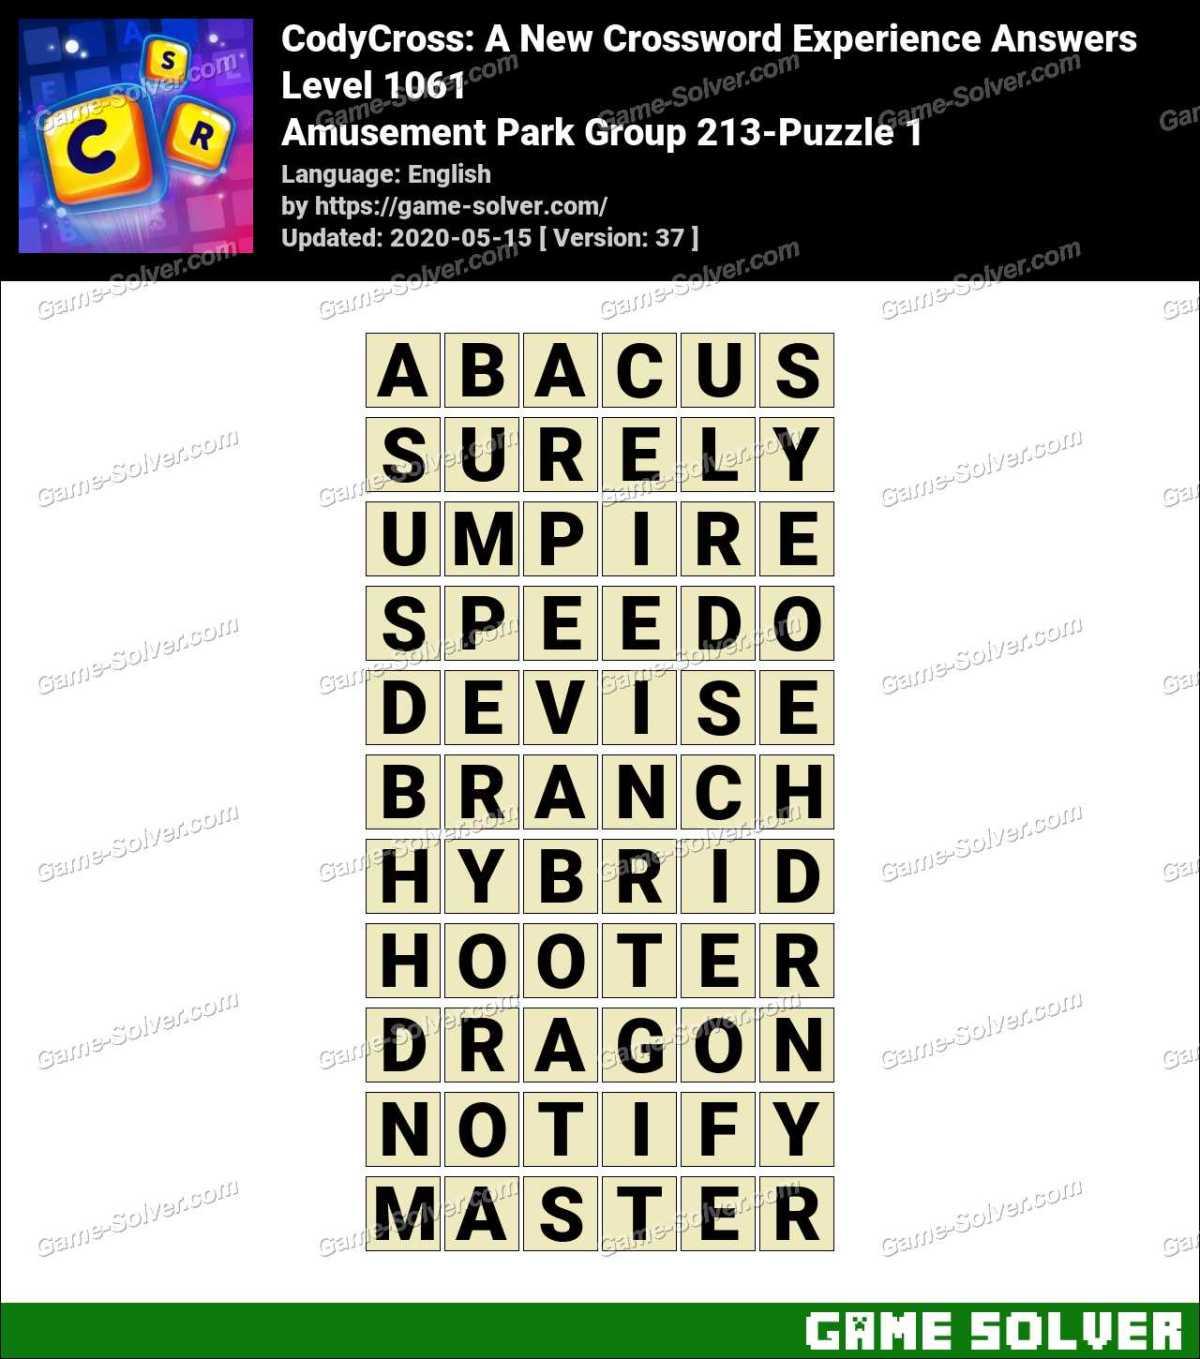 CodyCross Amusement Park Group 213-Puzzle 1 Answers